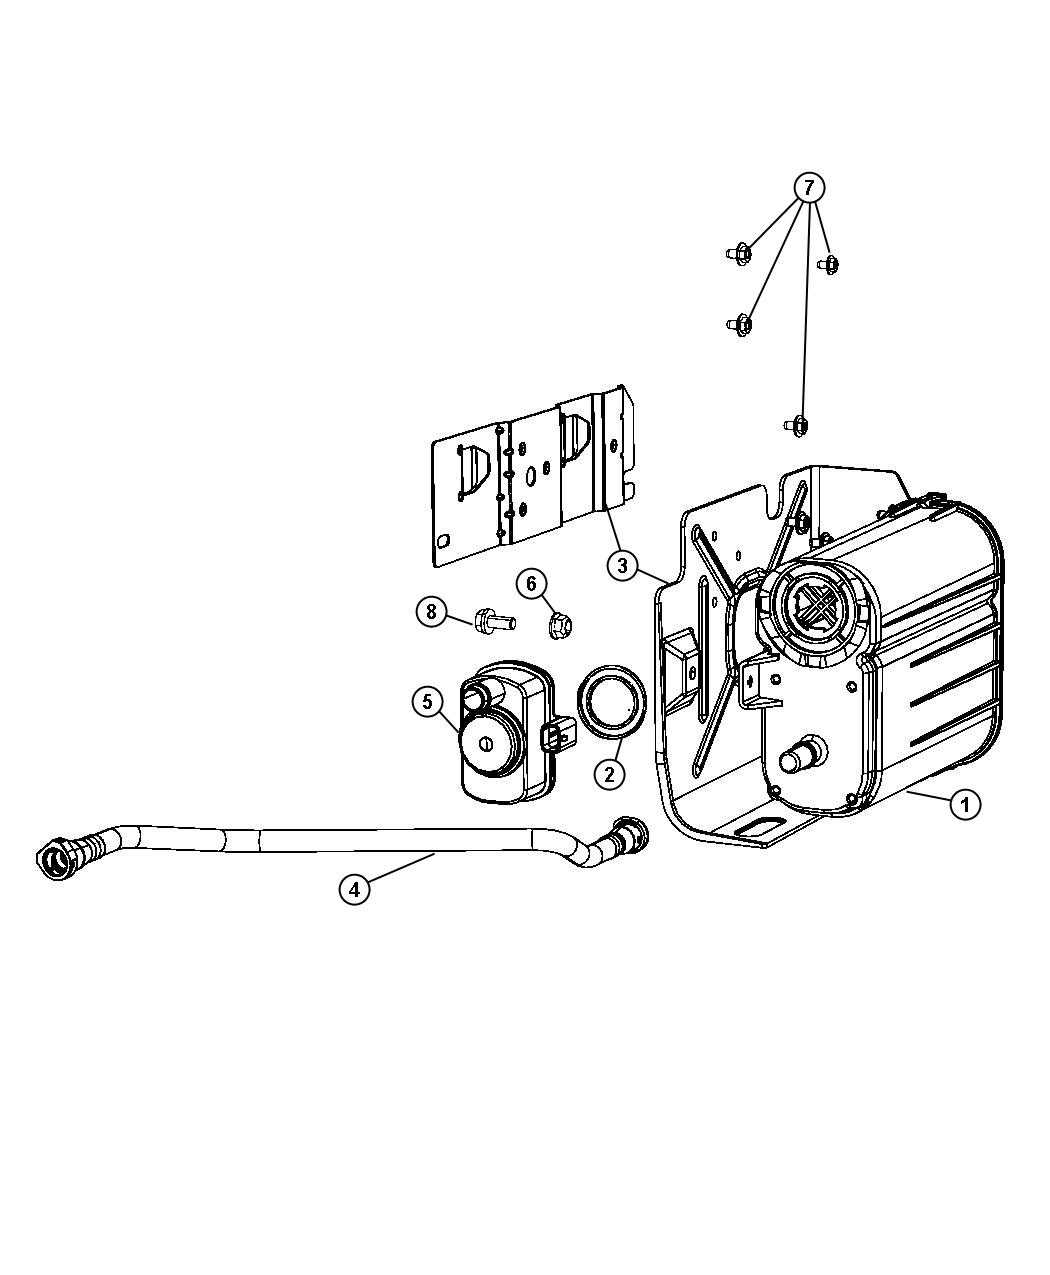 2014 Jeep Grand Cherokee Detector. Evaporative system